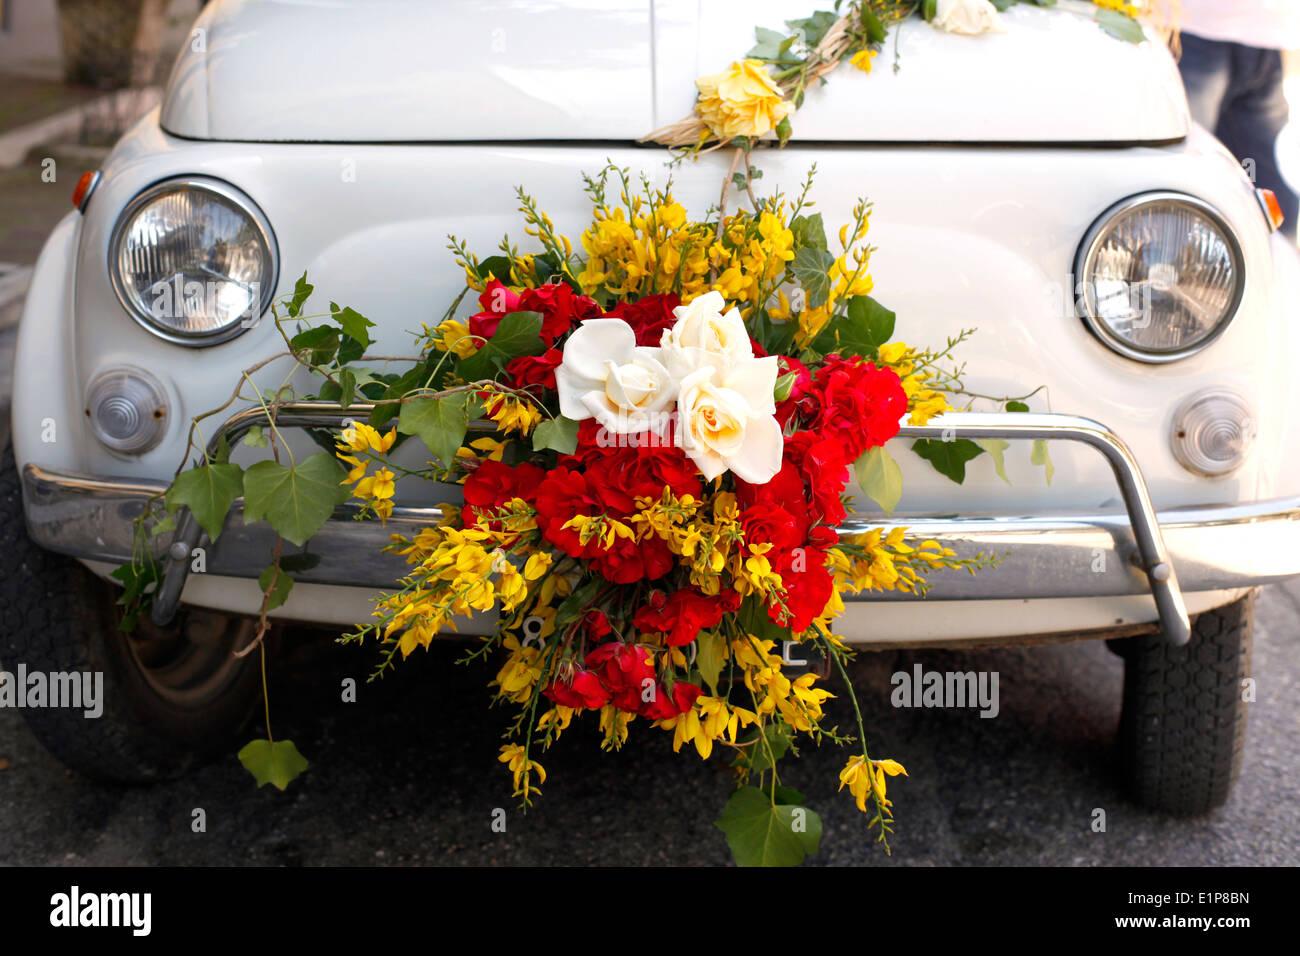 Fiat 500 decorated with flowers at the Festival of Pentecost in Civitella Casanova, Abruzzo, Italy. - Stock Image